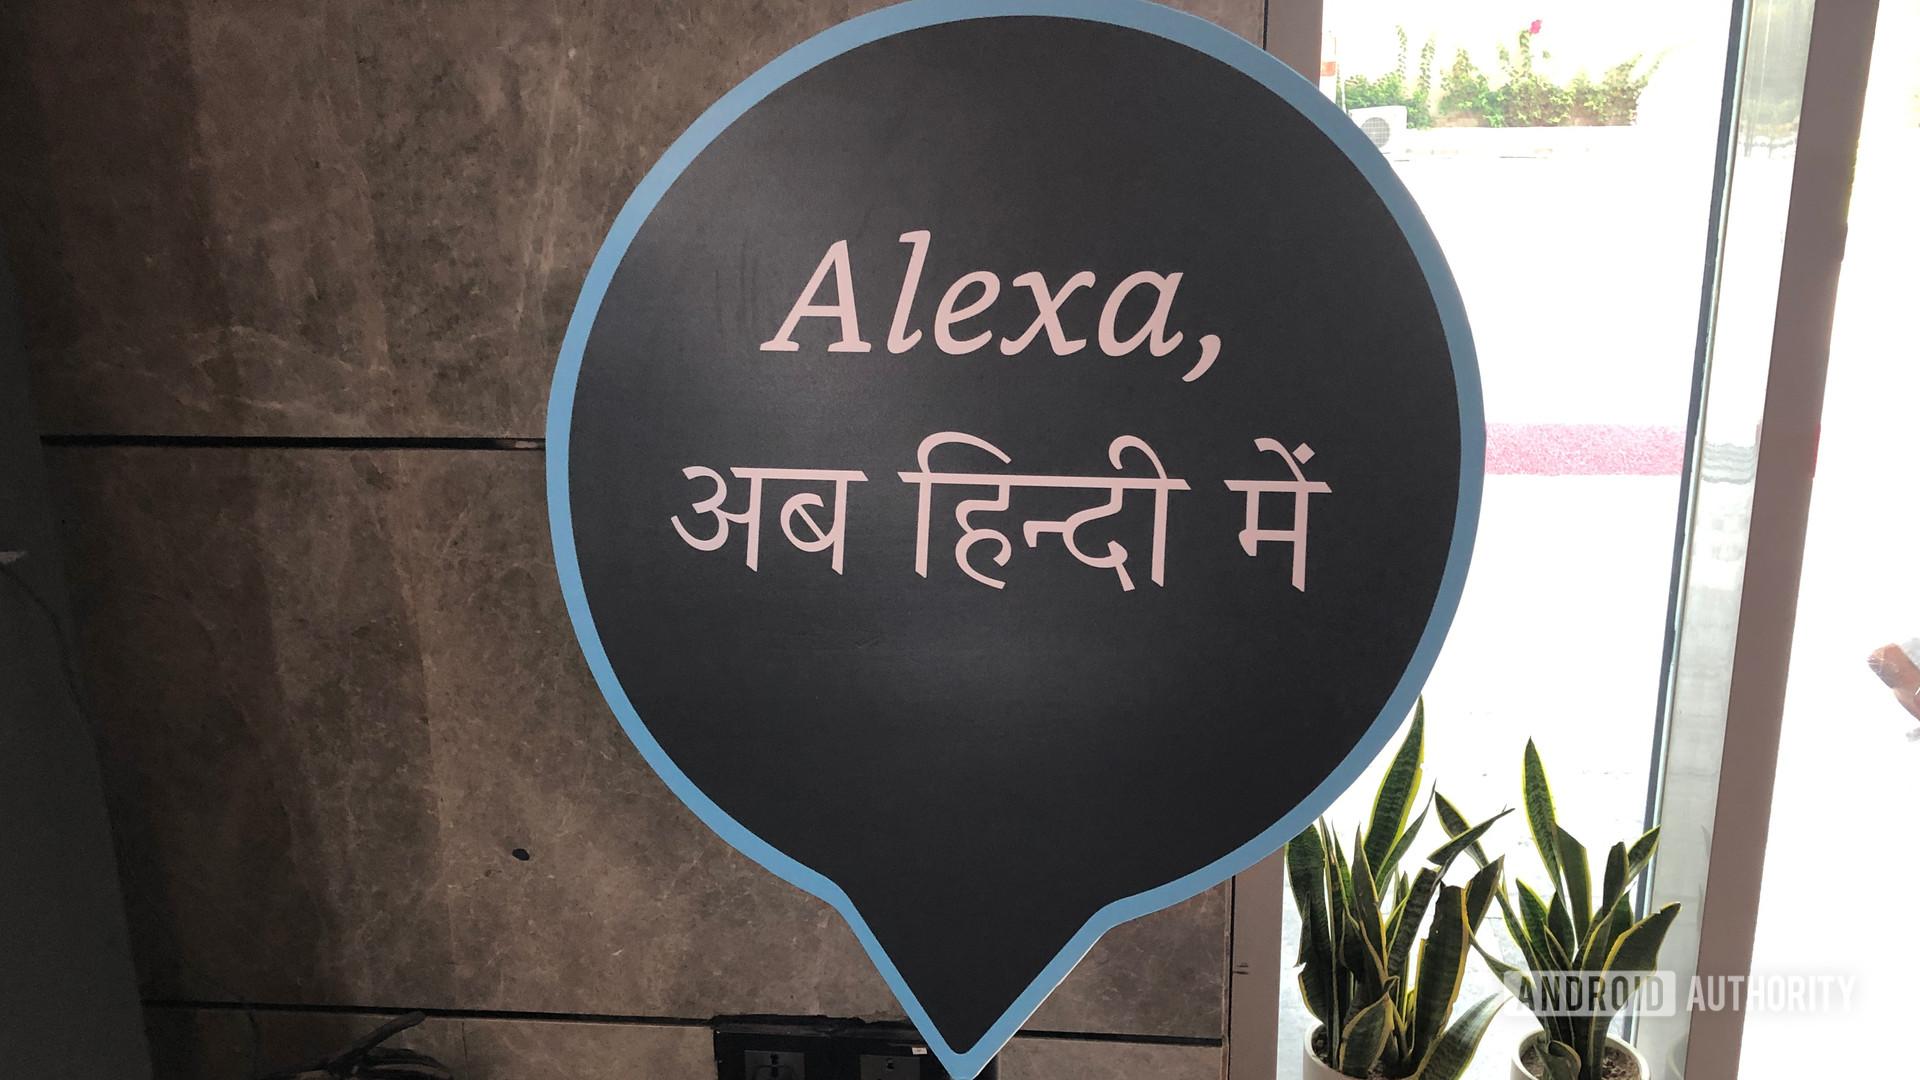 Alexa In Hindi On A Marketing Poster